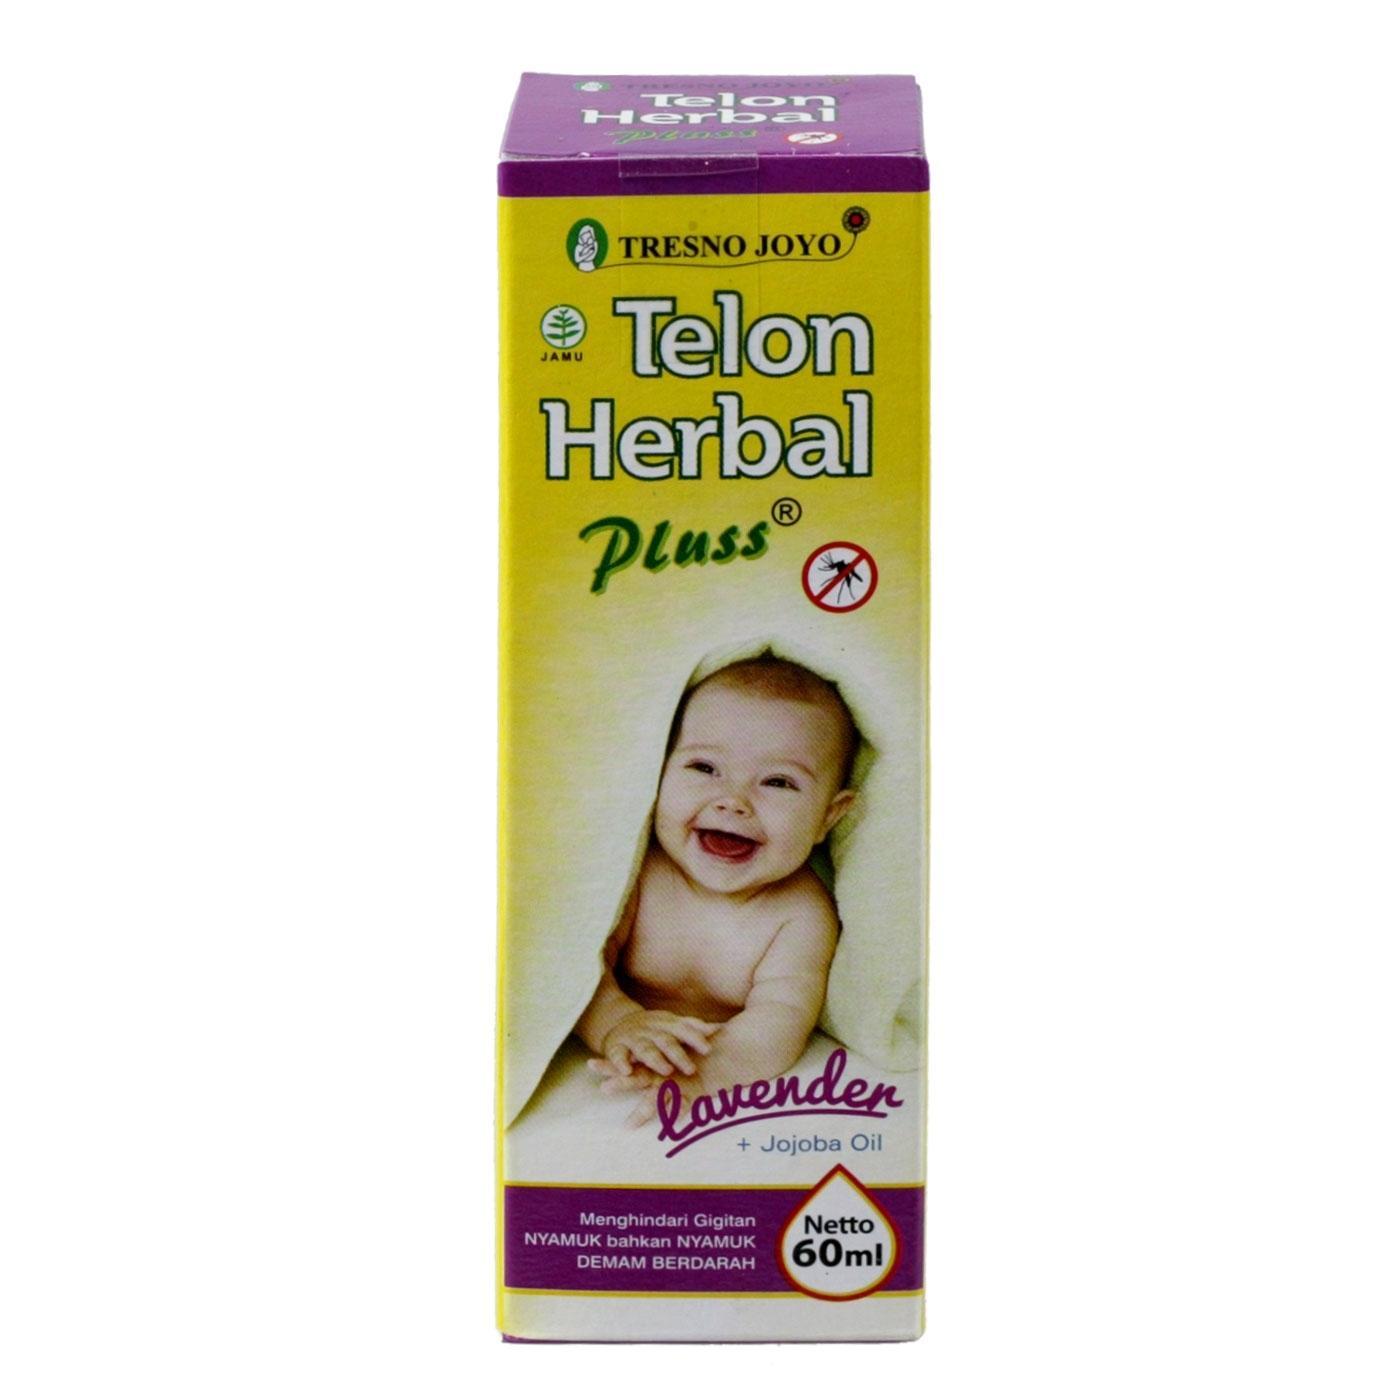 Perawatan Kulit Bayi Terbaik Lazada Zwitsal Baby Natural Minyak Telon 60ml Twin Pack Tresno Joyo Herbal Plus Lavender